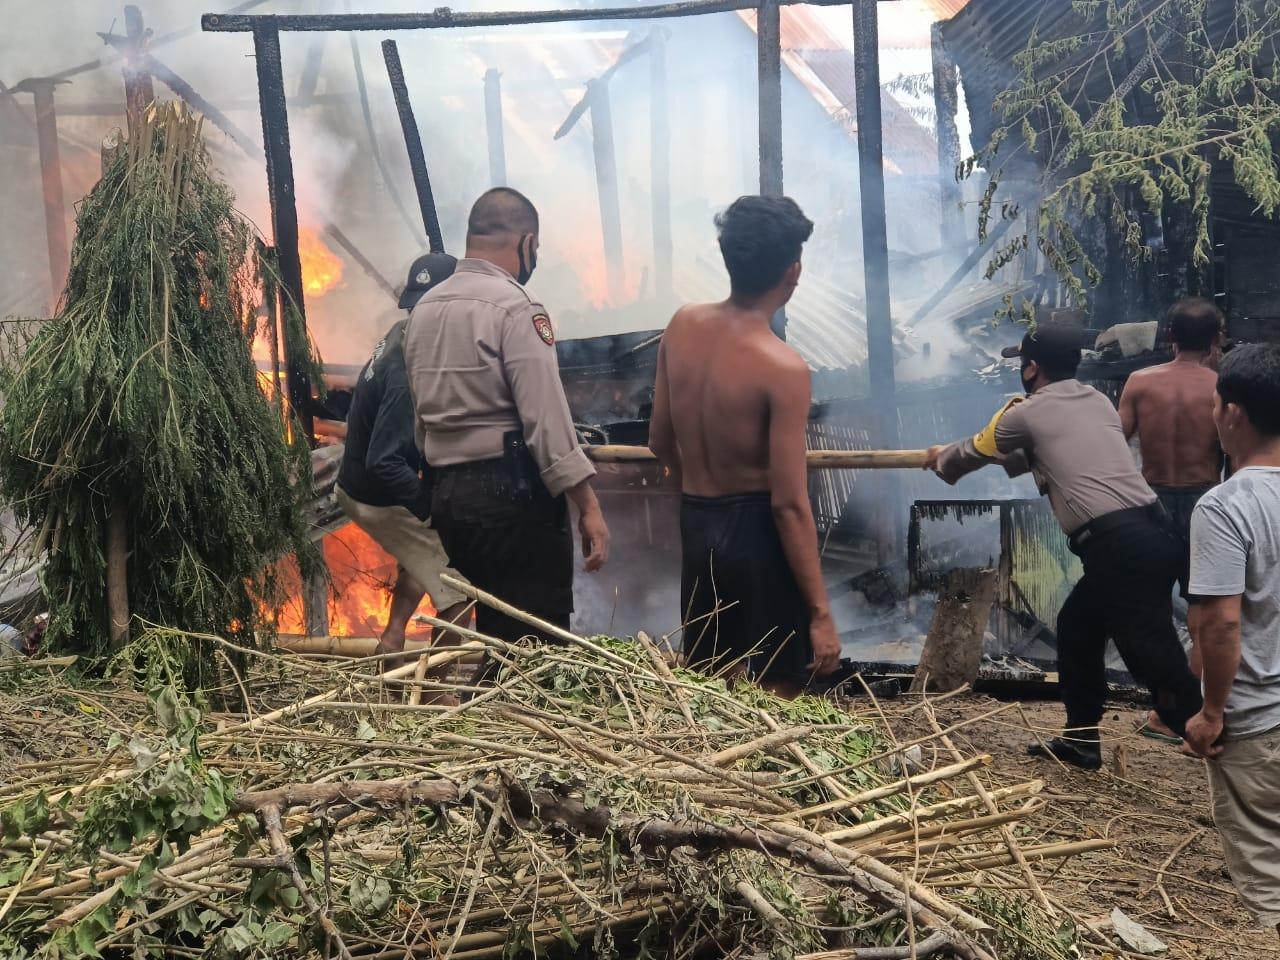 img Polisi Bantu Evakuasi Kebakaran di Dusun Porendeang Majene